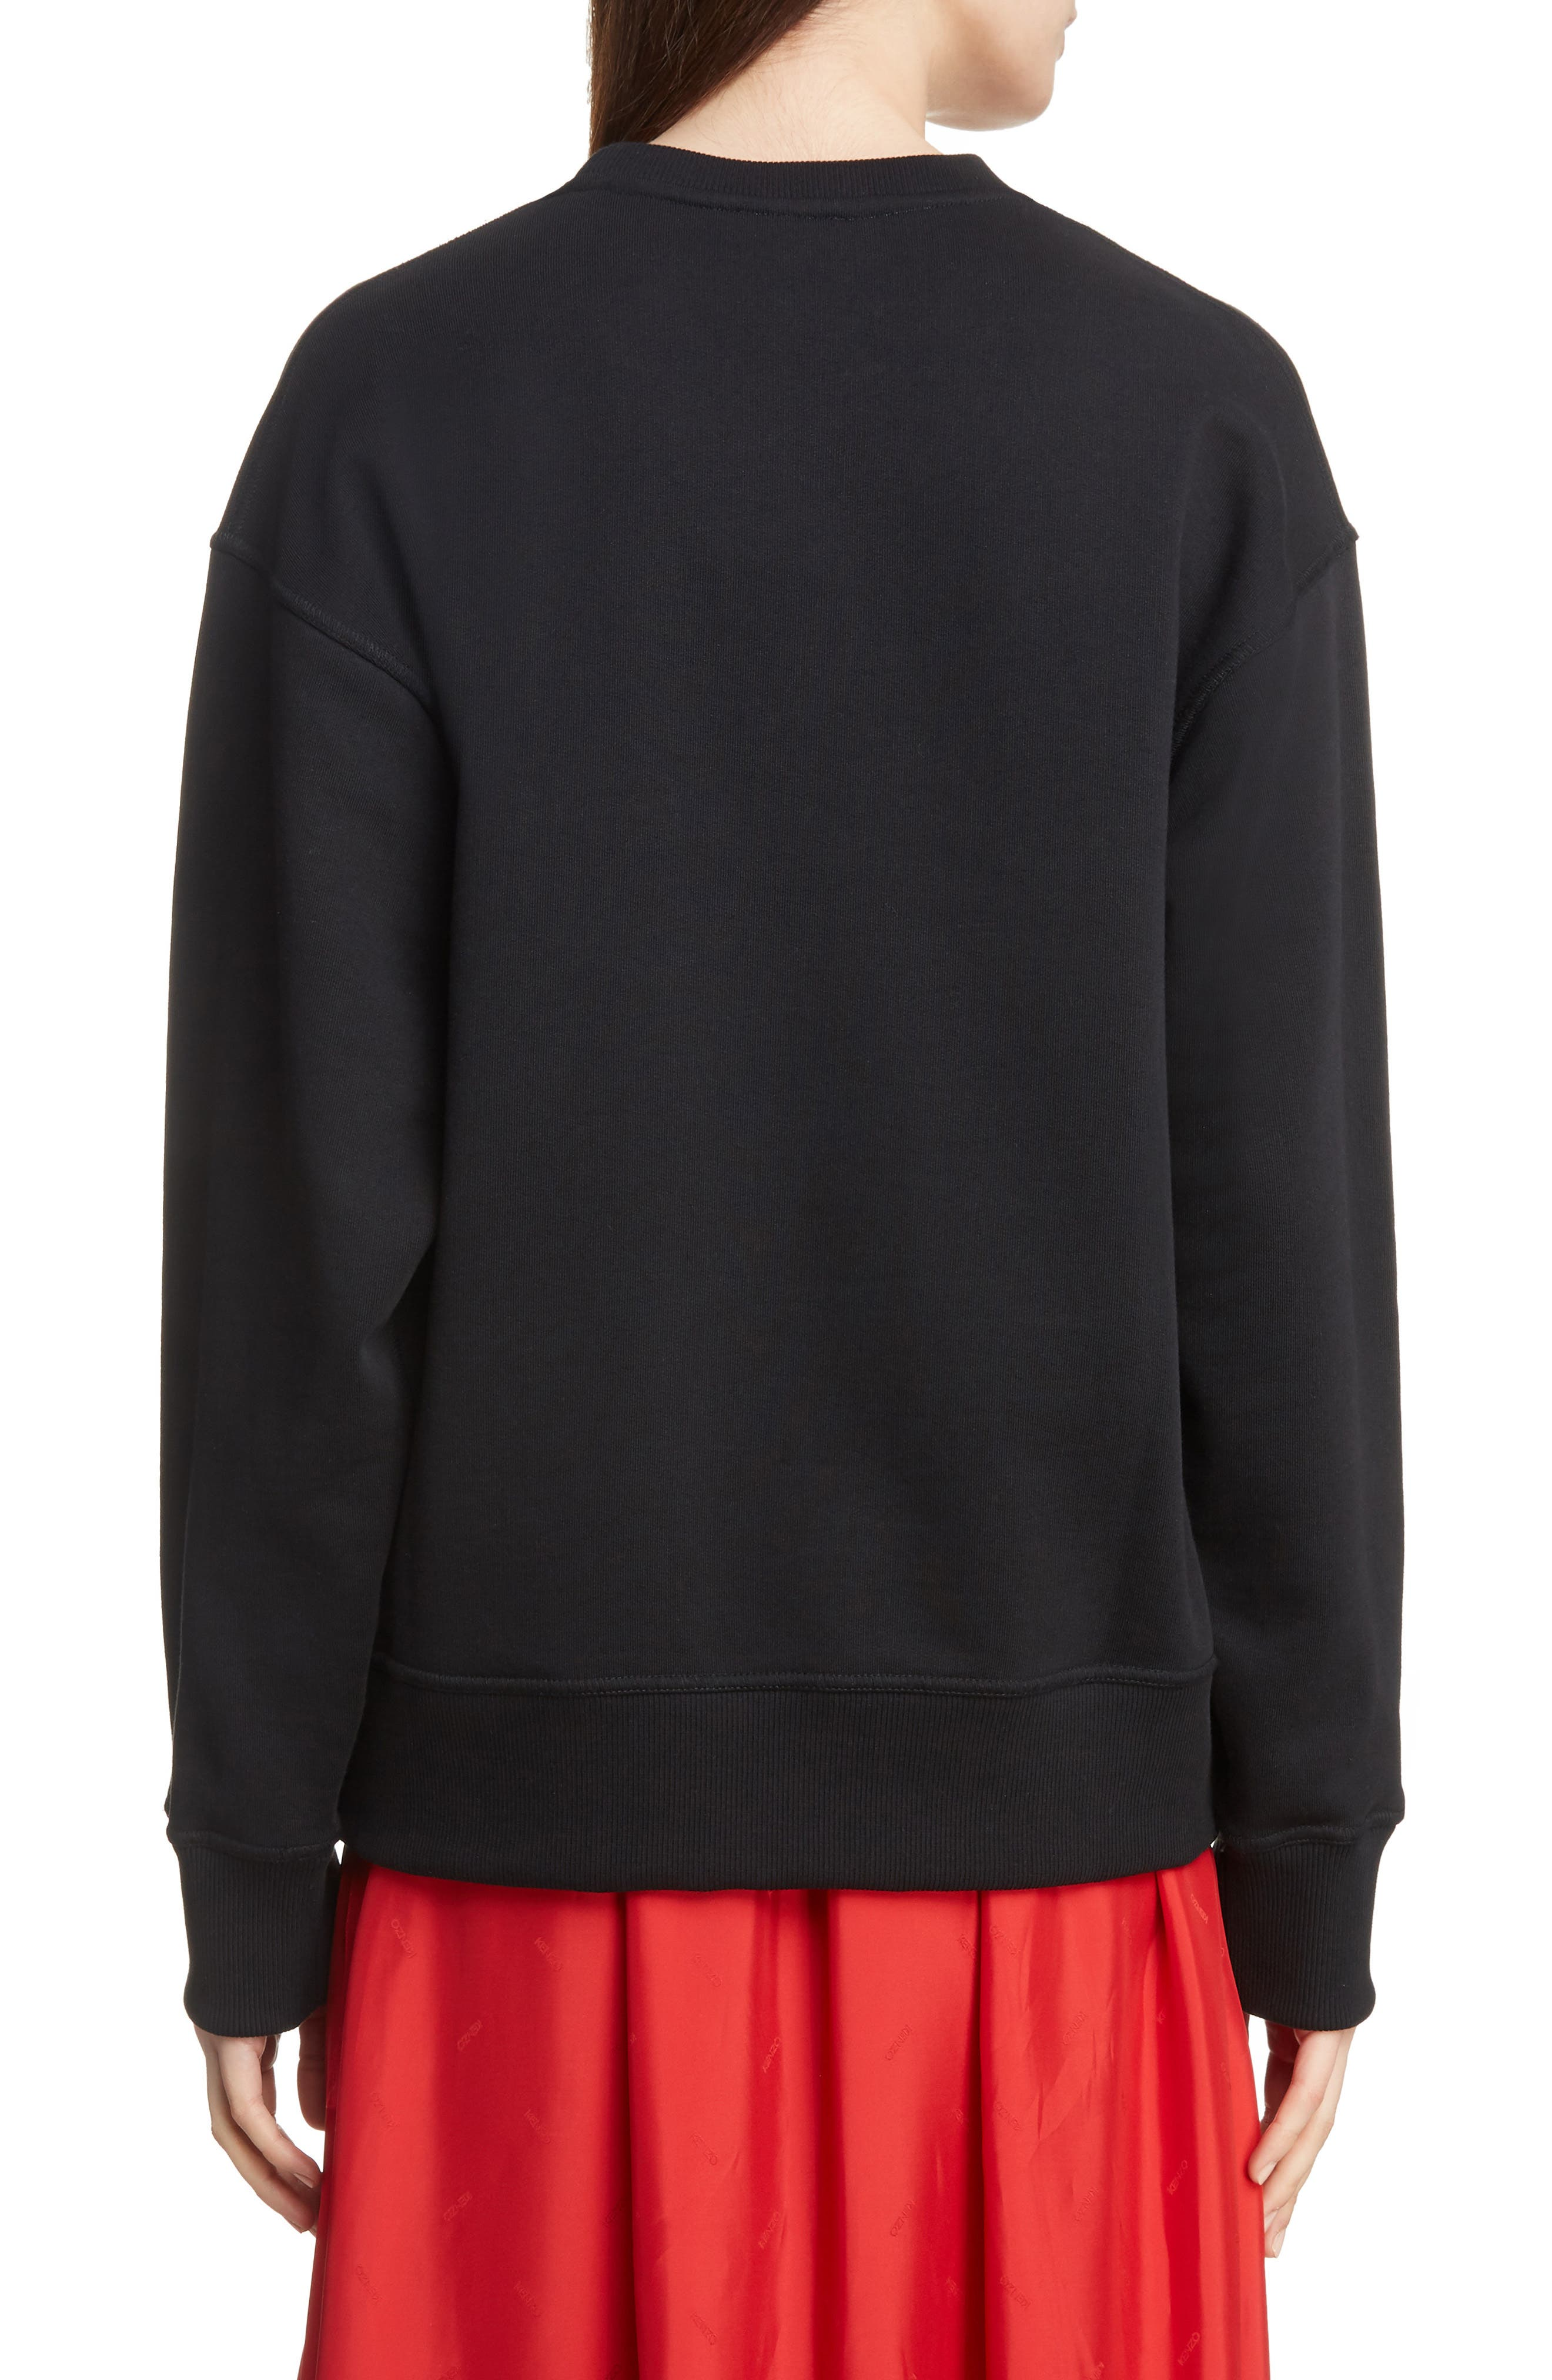 Tiger Relax Sweatshirt,                             Alternate thumbnail 2, color,                             BLACK